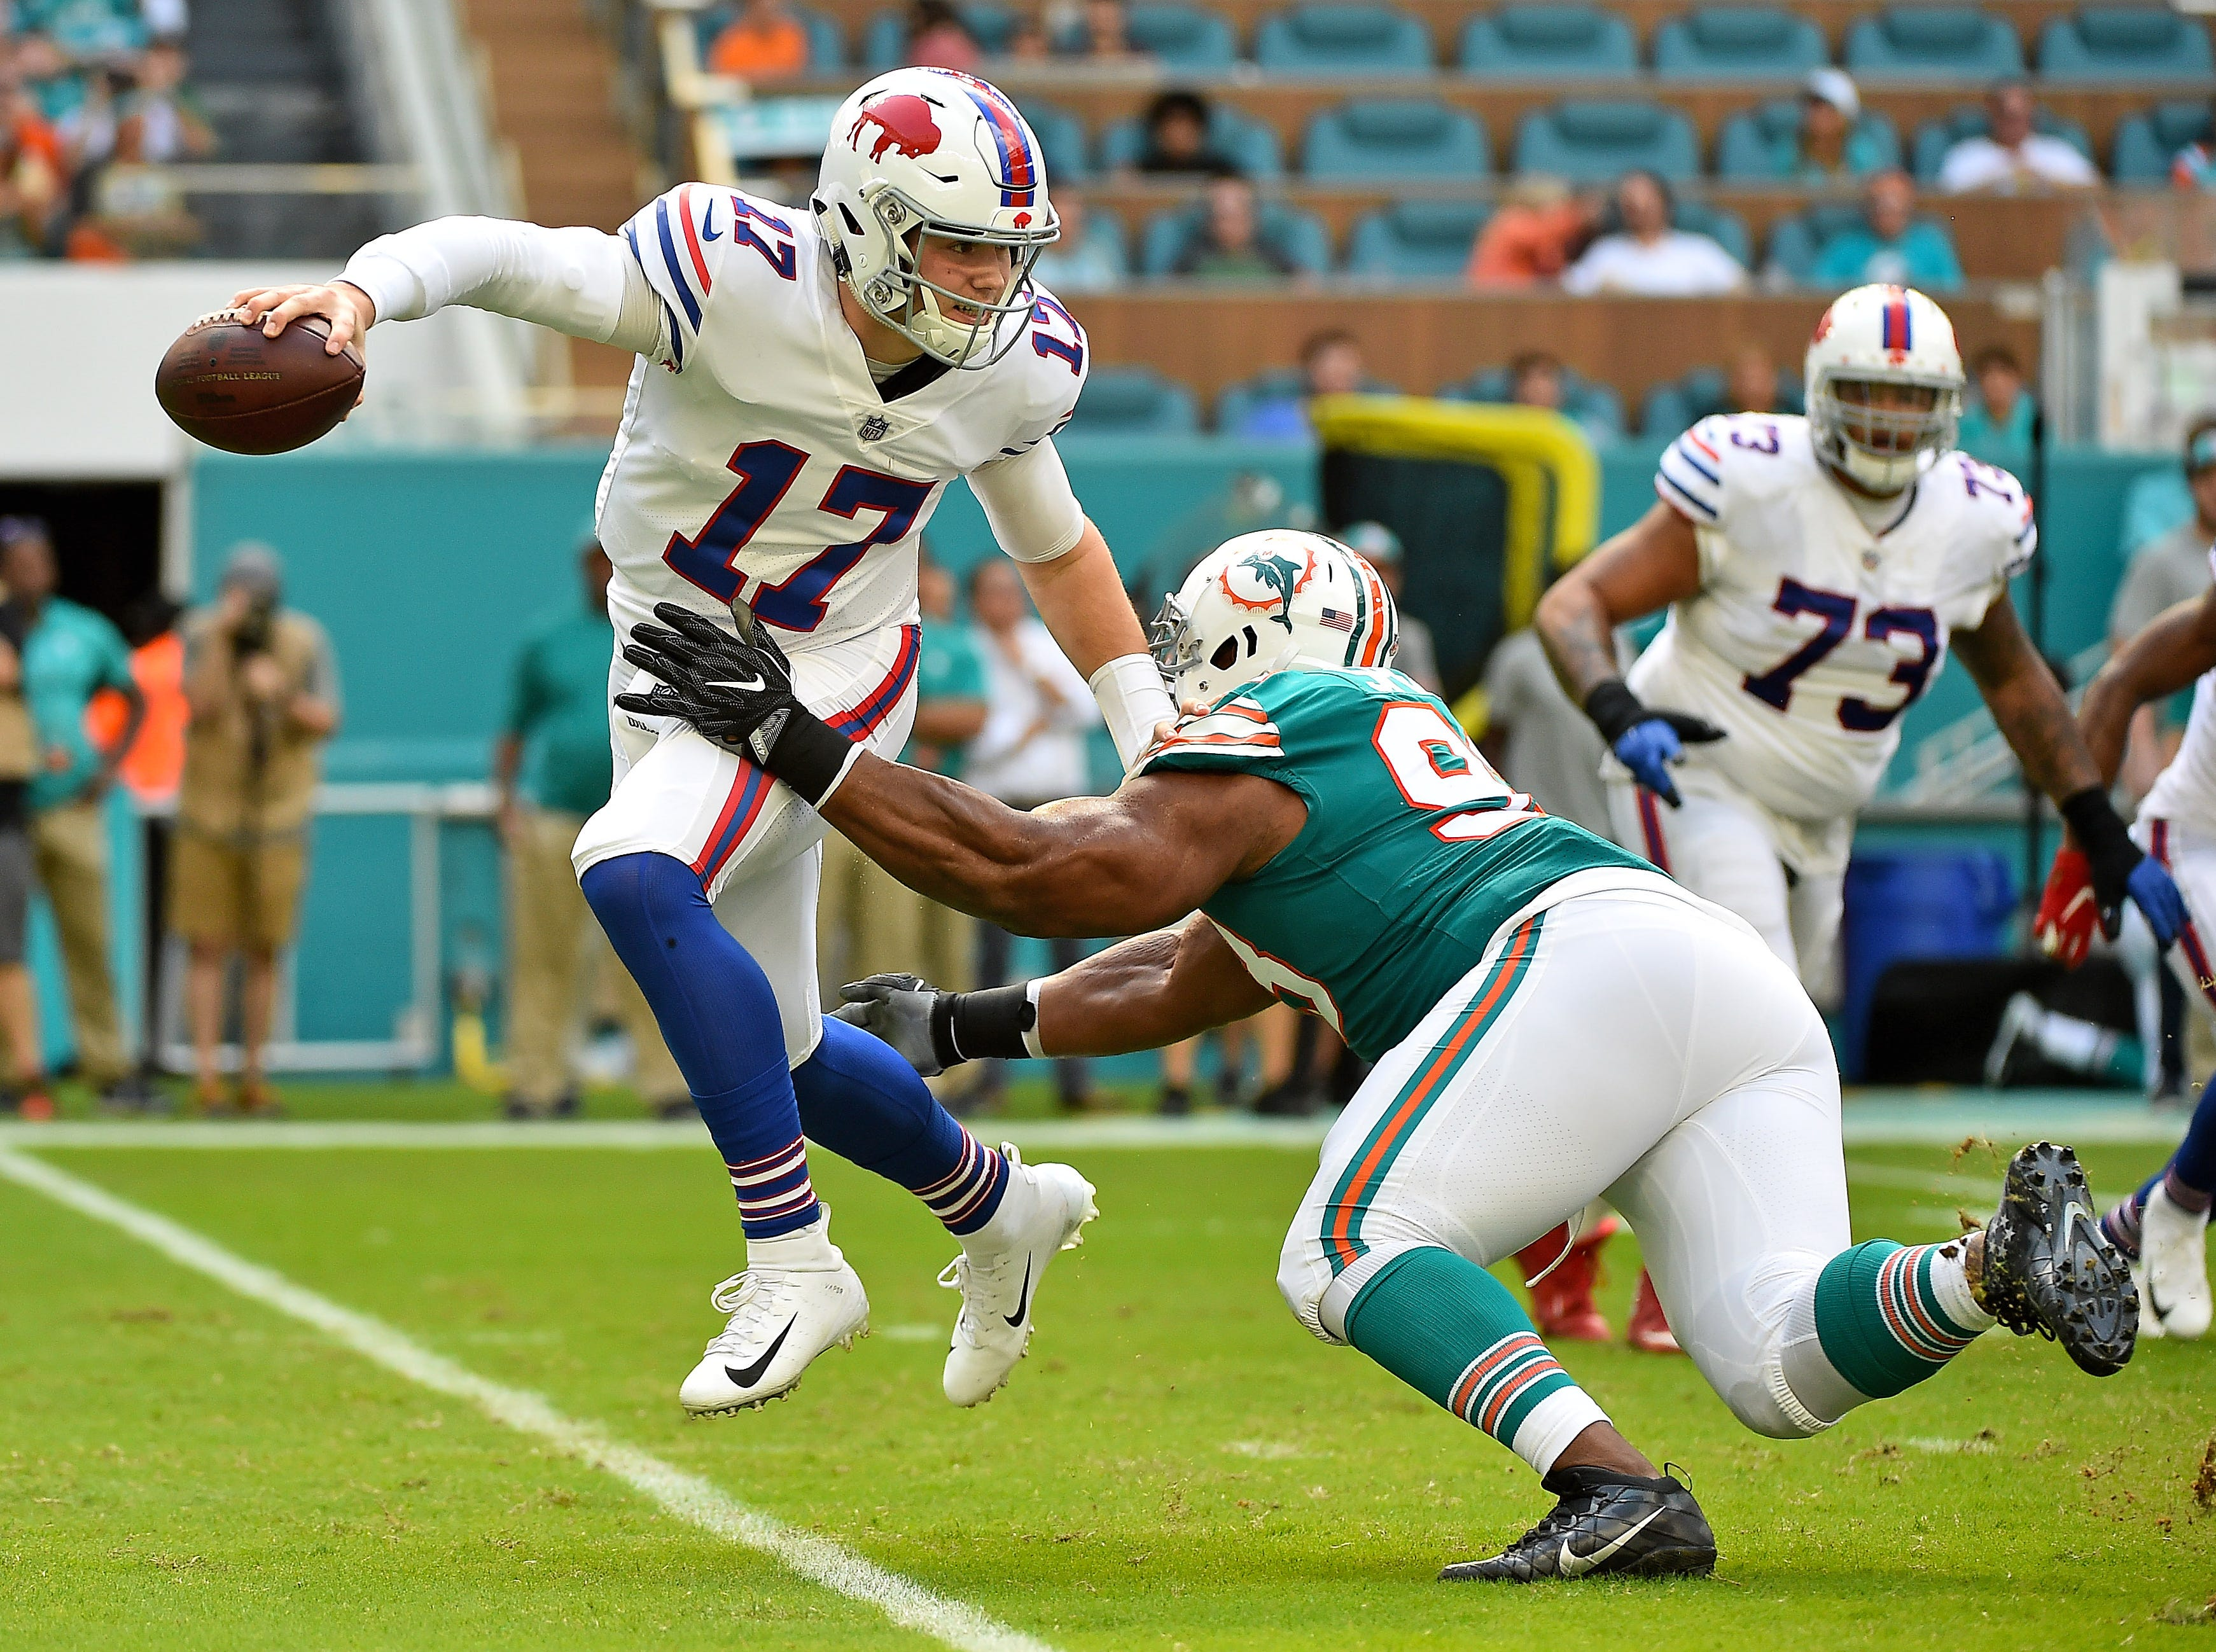 Dec 2, 2018; Miami Gardens, FL, USA; Miami Dolphins defensive tackle Akeem Spence (93) pressures Buffalo Bills quarterback Josh Allen (17) during the first half at Hard Rock Stadium. Mandatory Credit: Jasen Vinlove-USA TODAY Sports